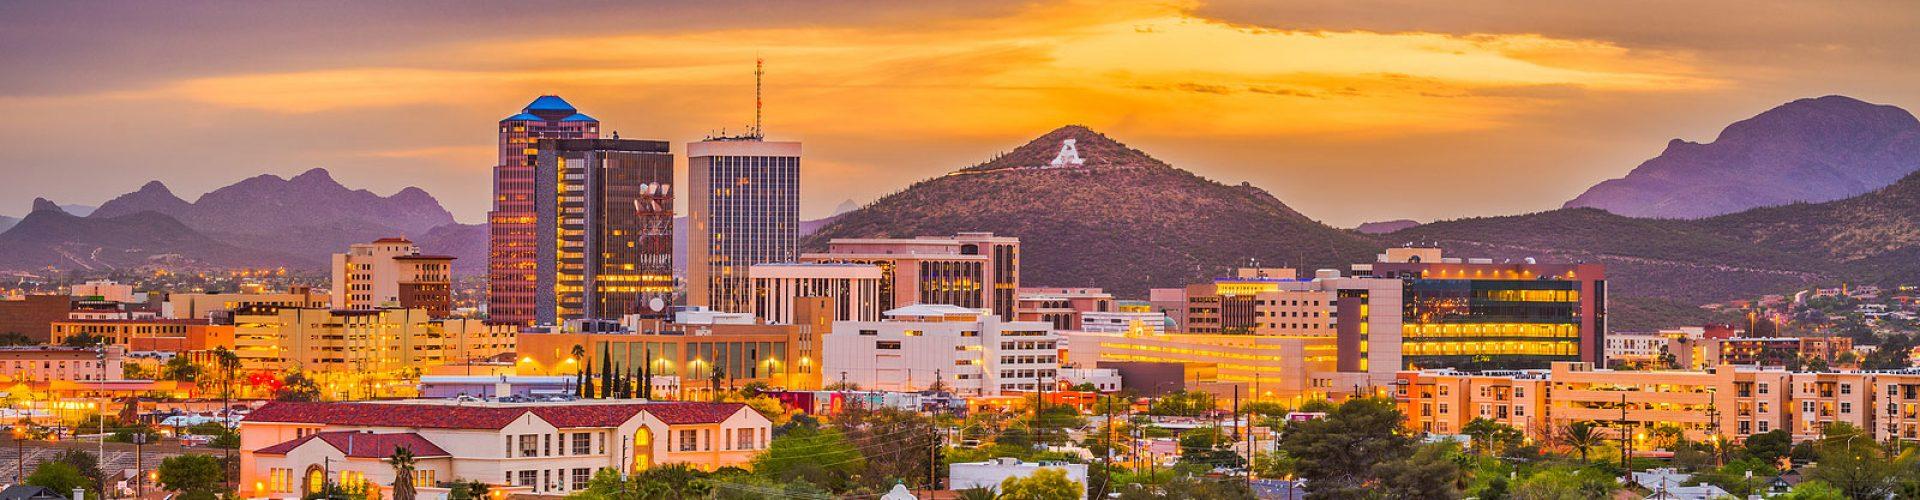 BainLawFirm-Tucson